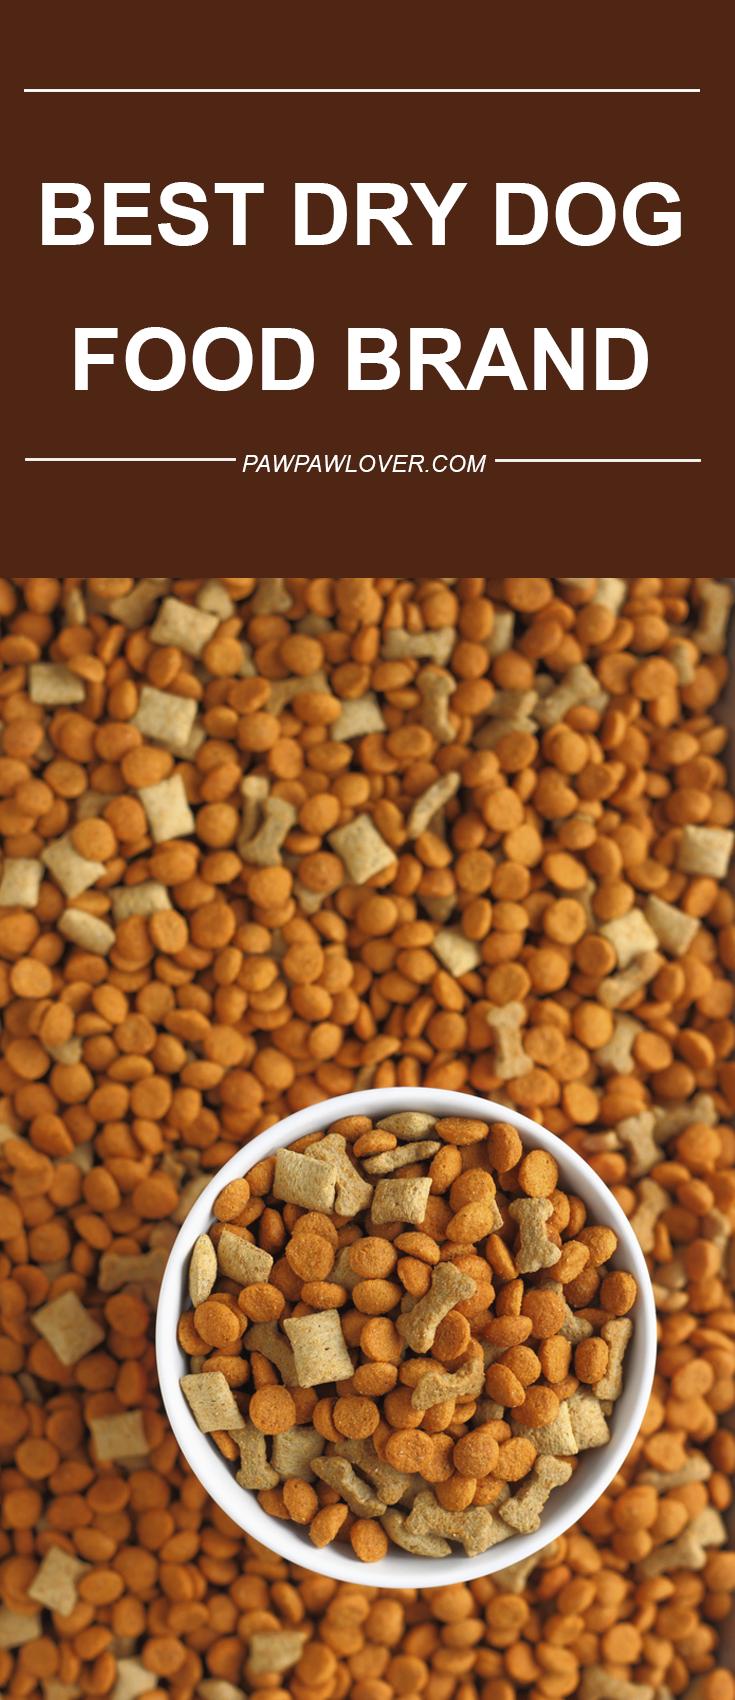 10 Best Dog Food Brands (Dry & Canned) 2020 Dog Food